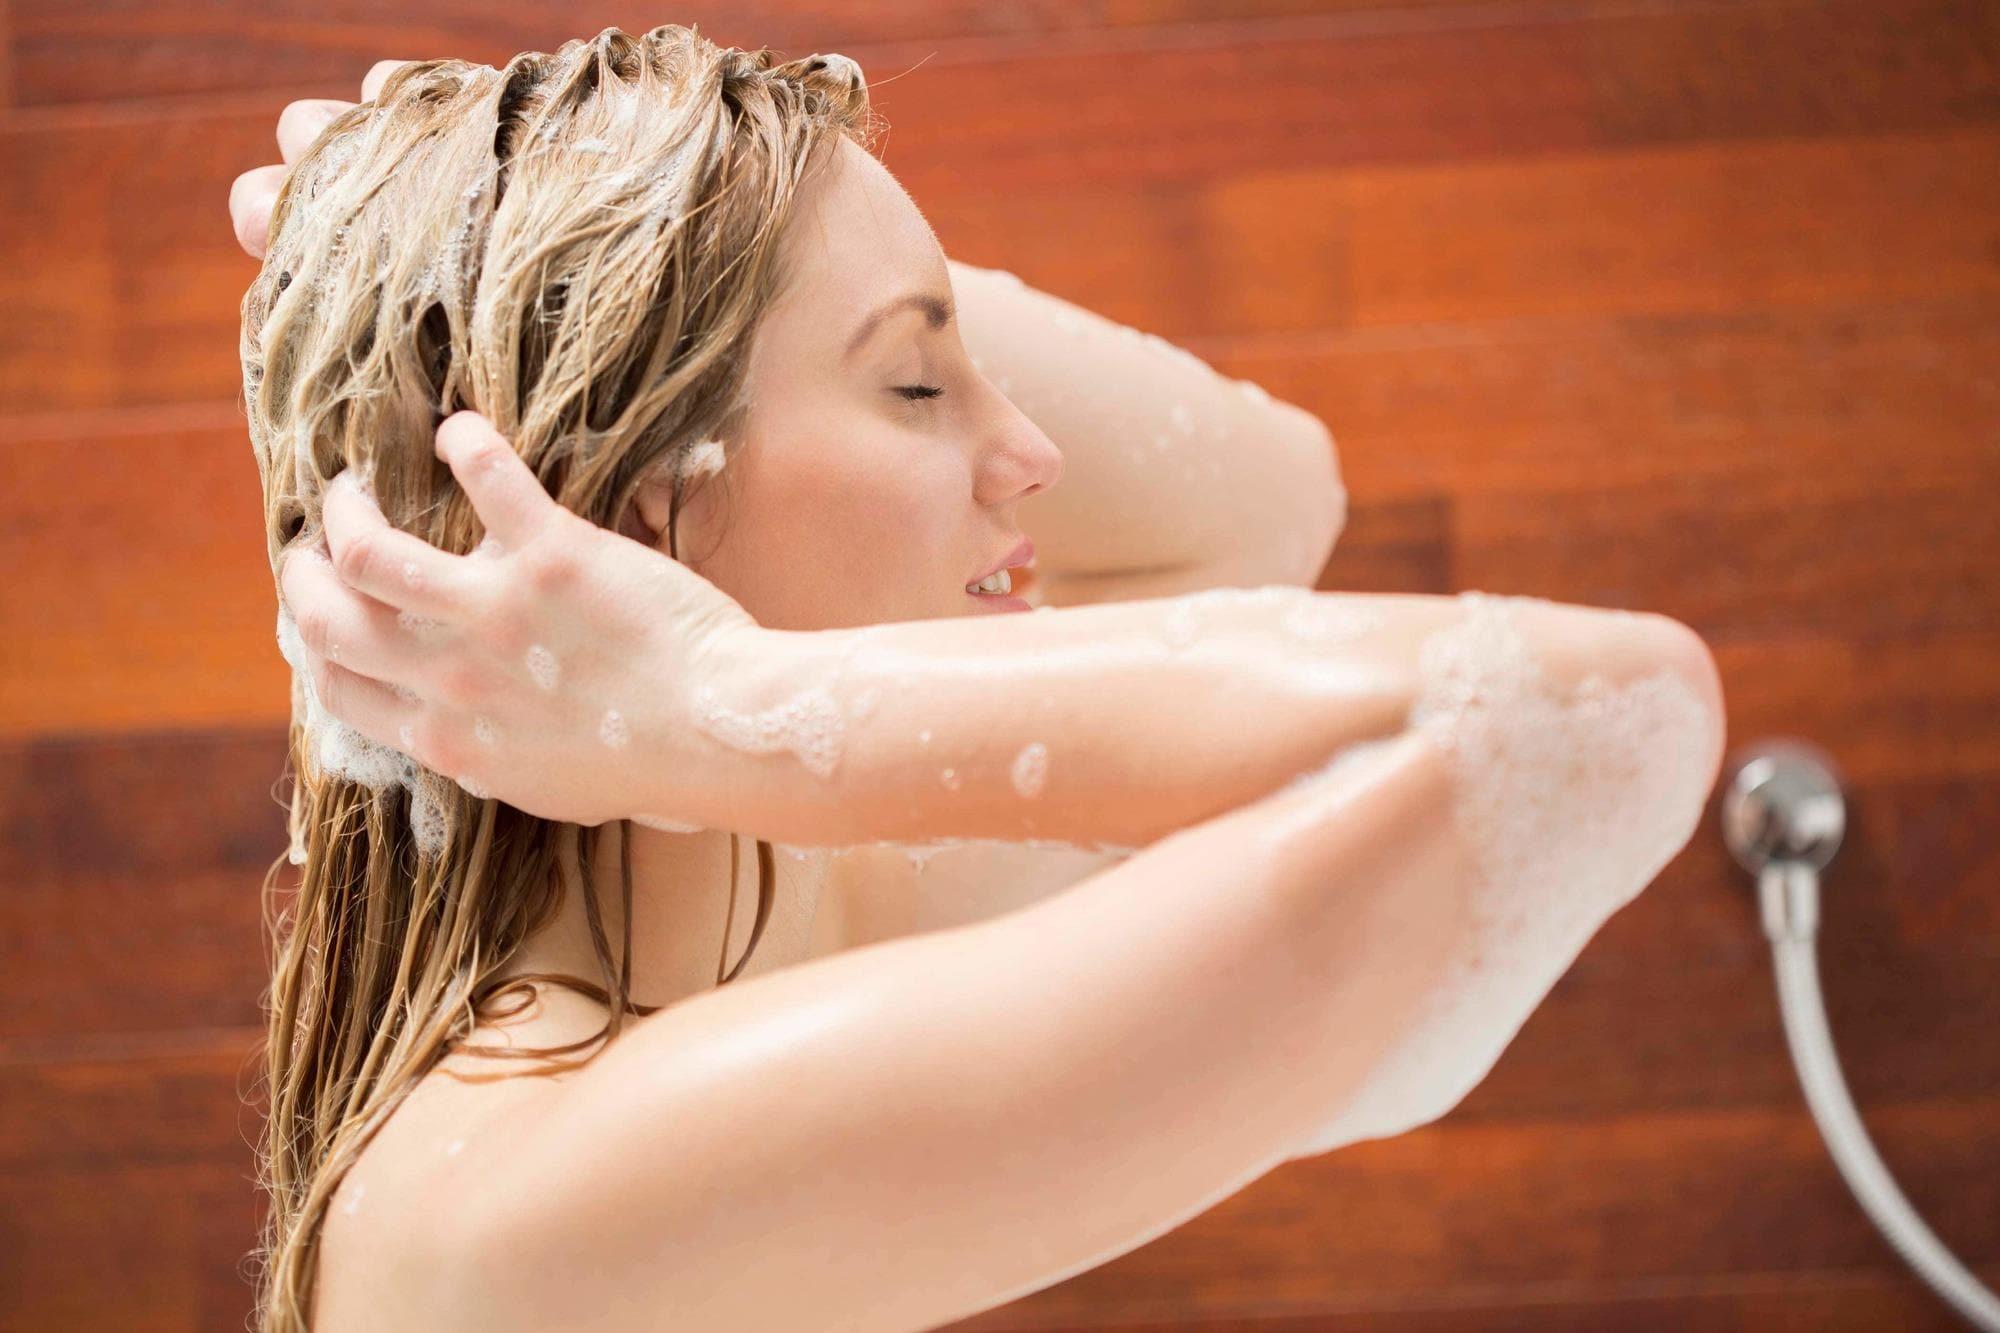 healthy shampoo for showers